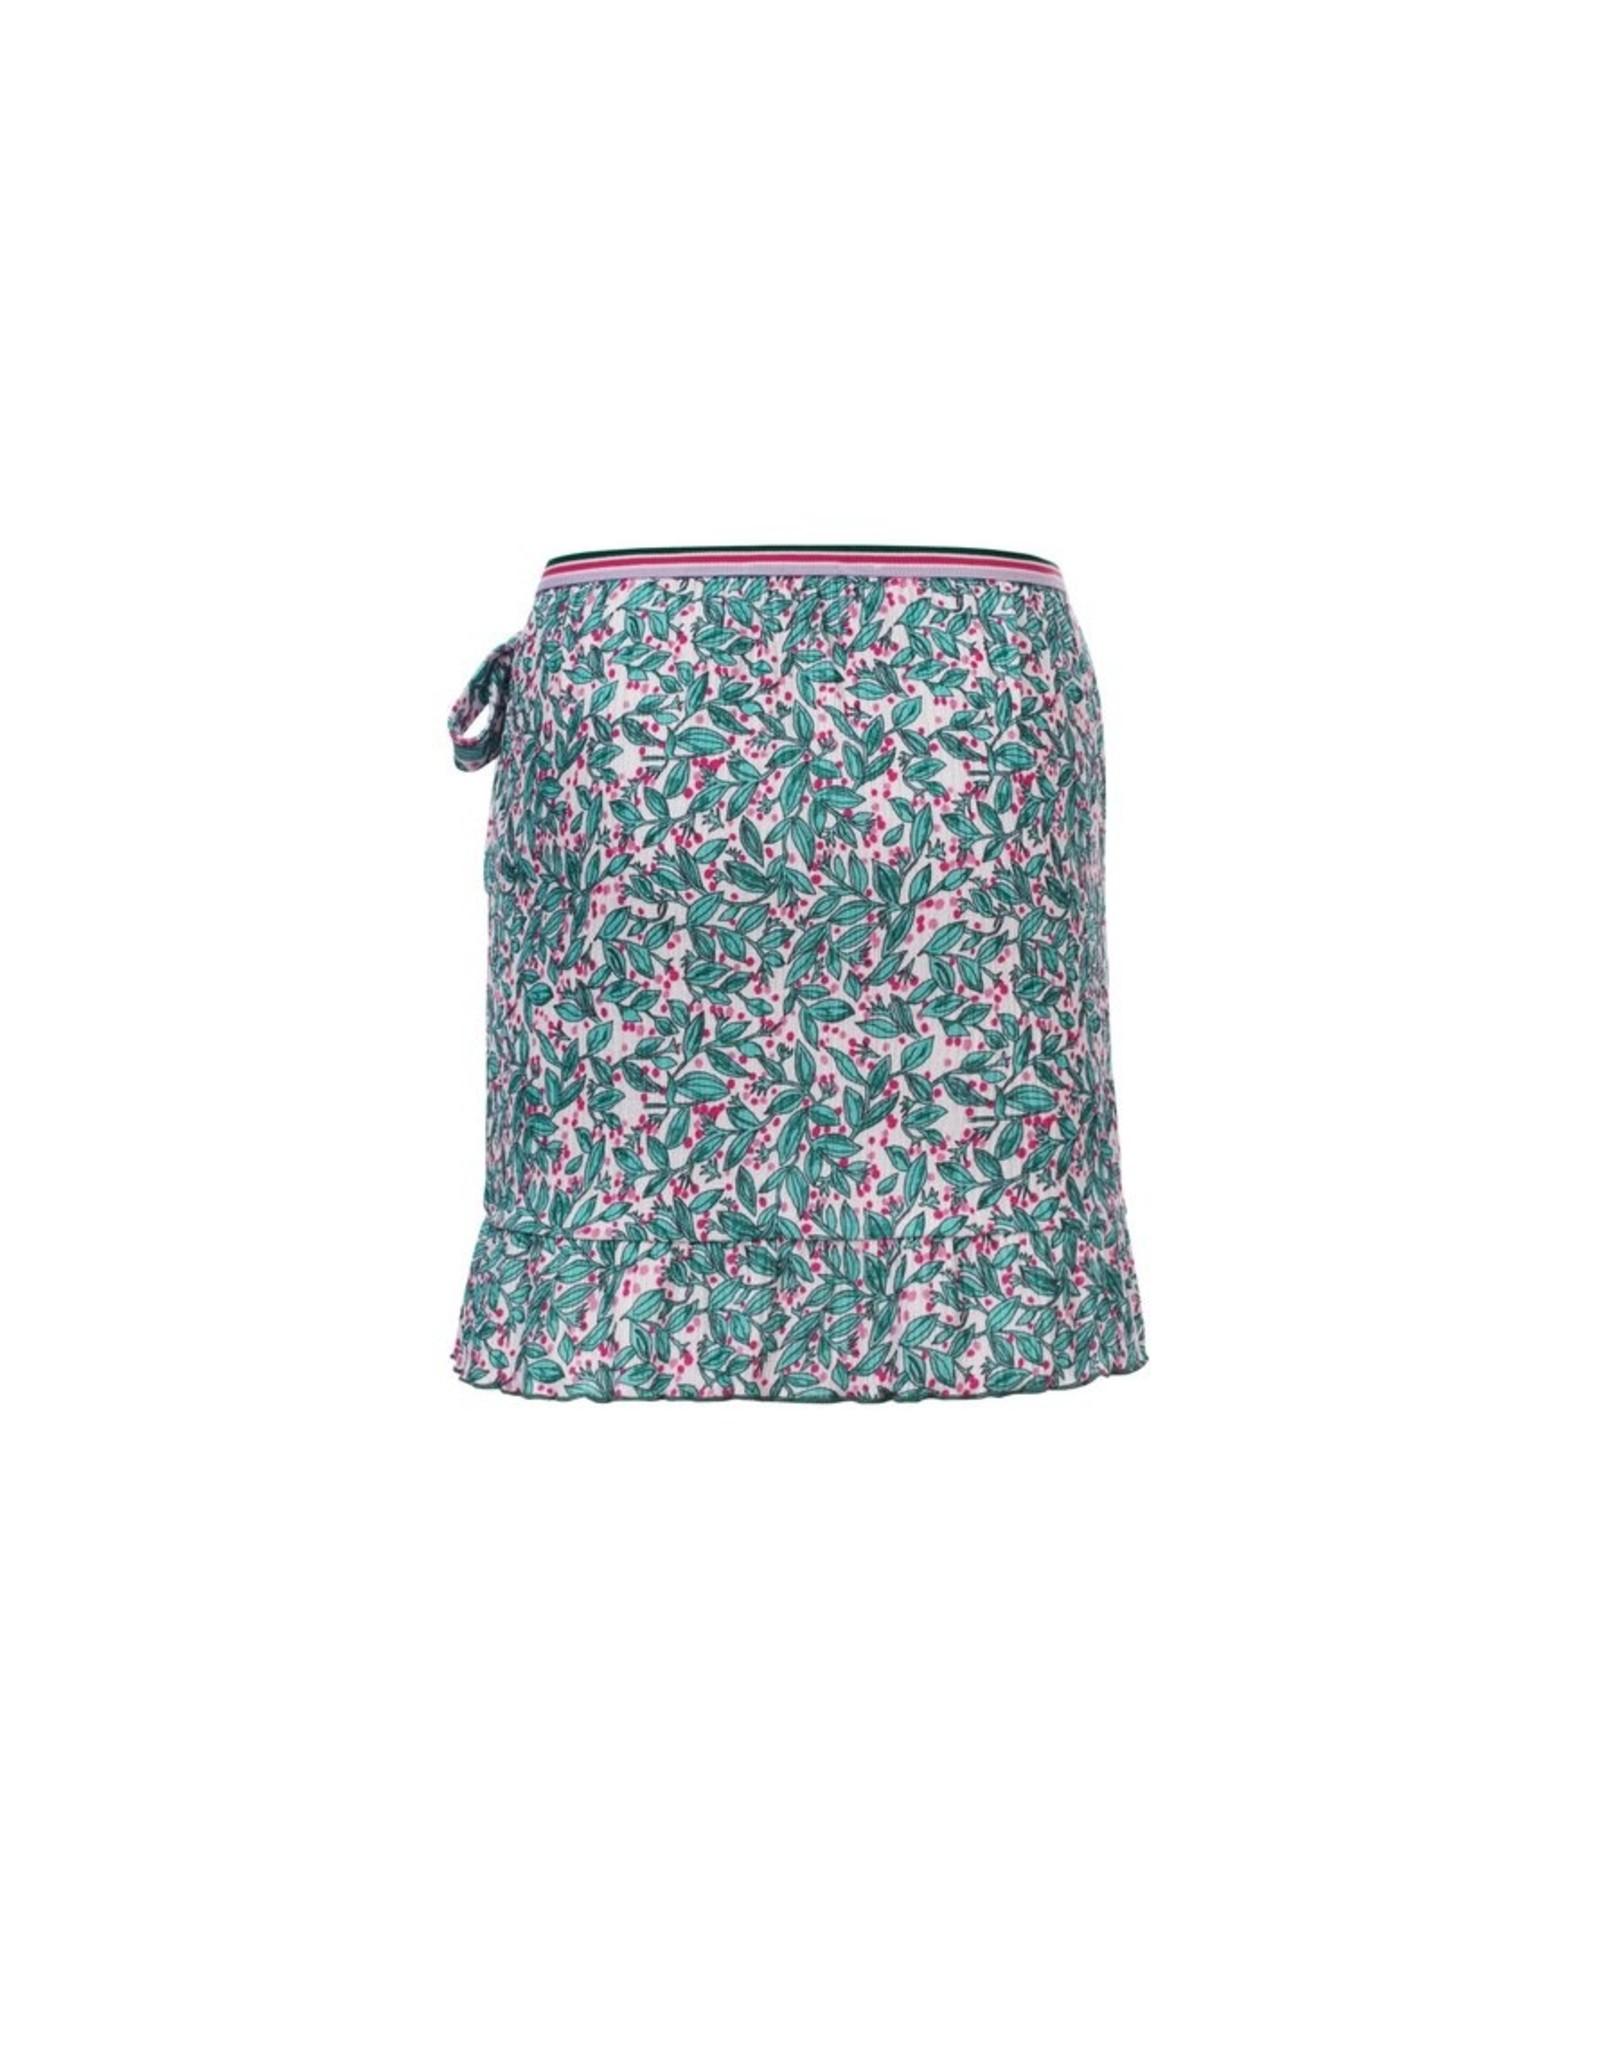 LOOXS Little Little woven  skirt ruffl, Bardot stripe Y/D